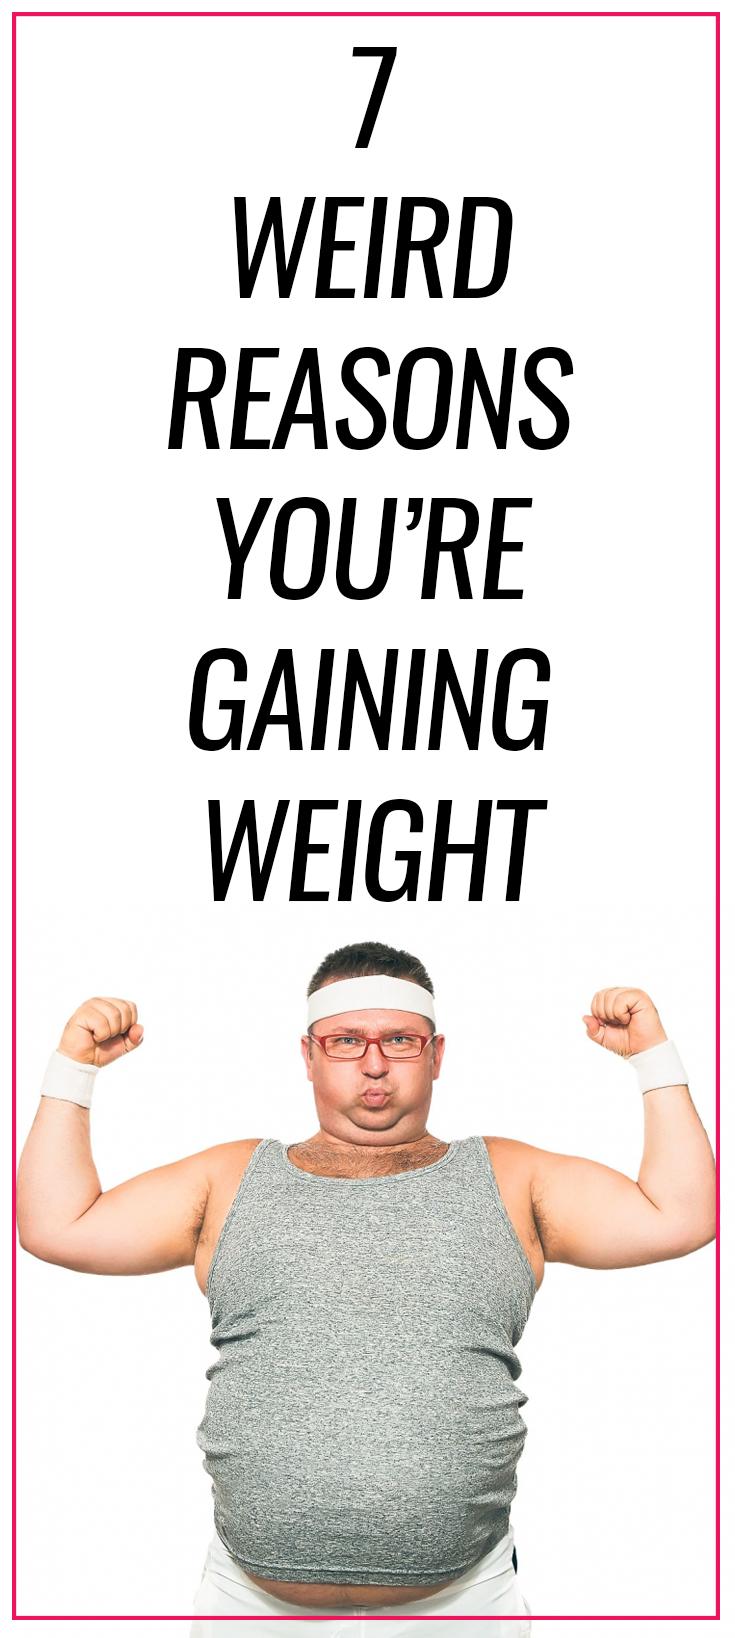 gaining weight pin